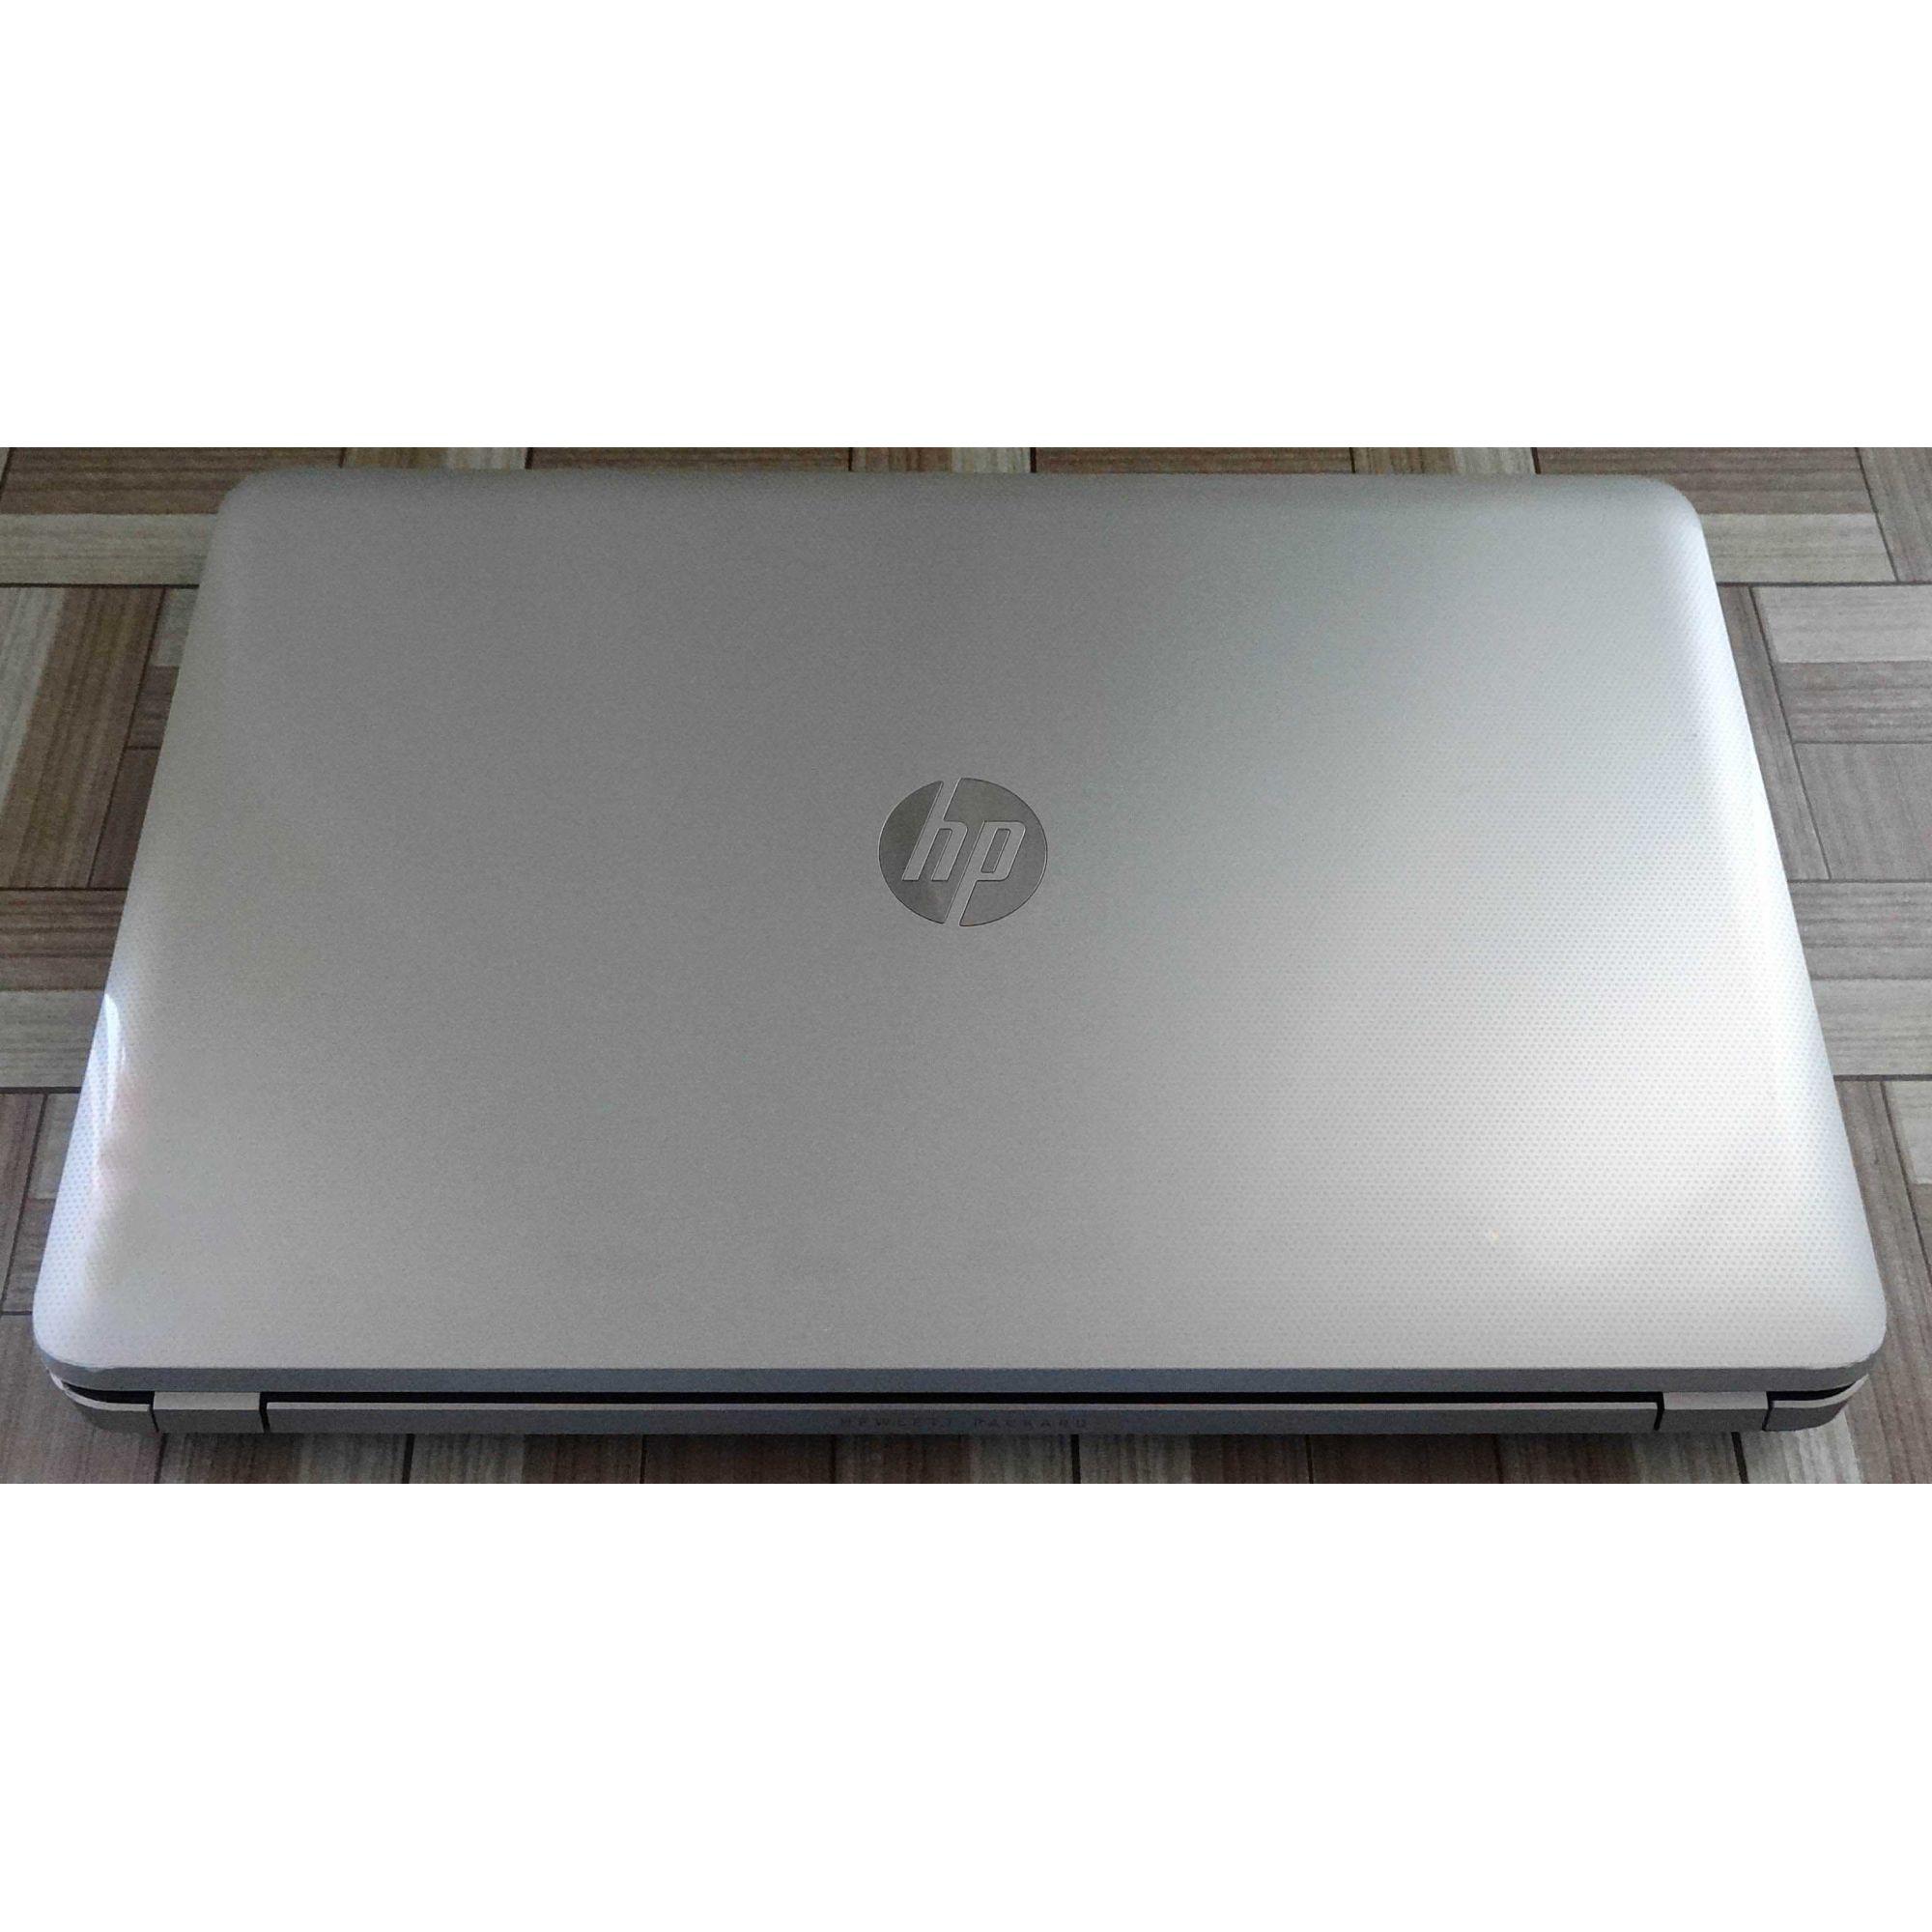 "Notebook HP Pavilion 17-e112dx 17"" Intel Core i3 2.6GHz 4GB 750GB HD + Alphanumérico"